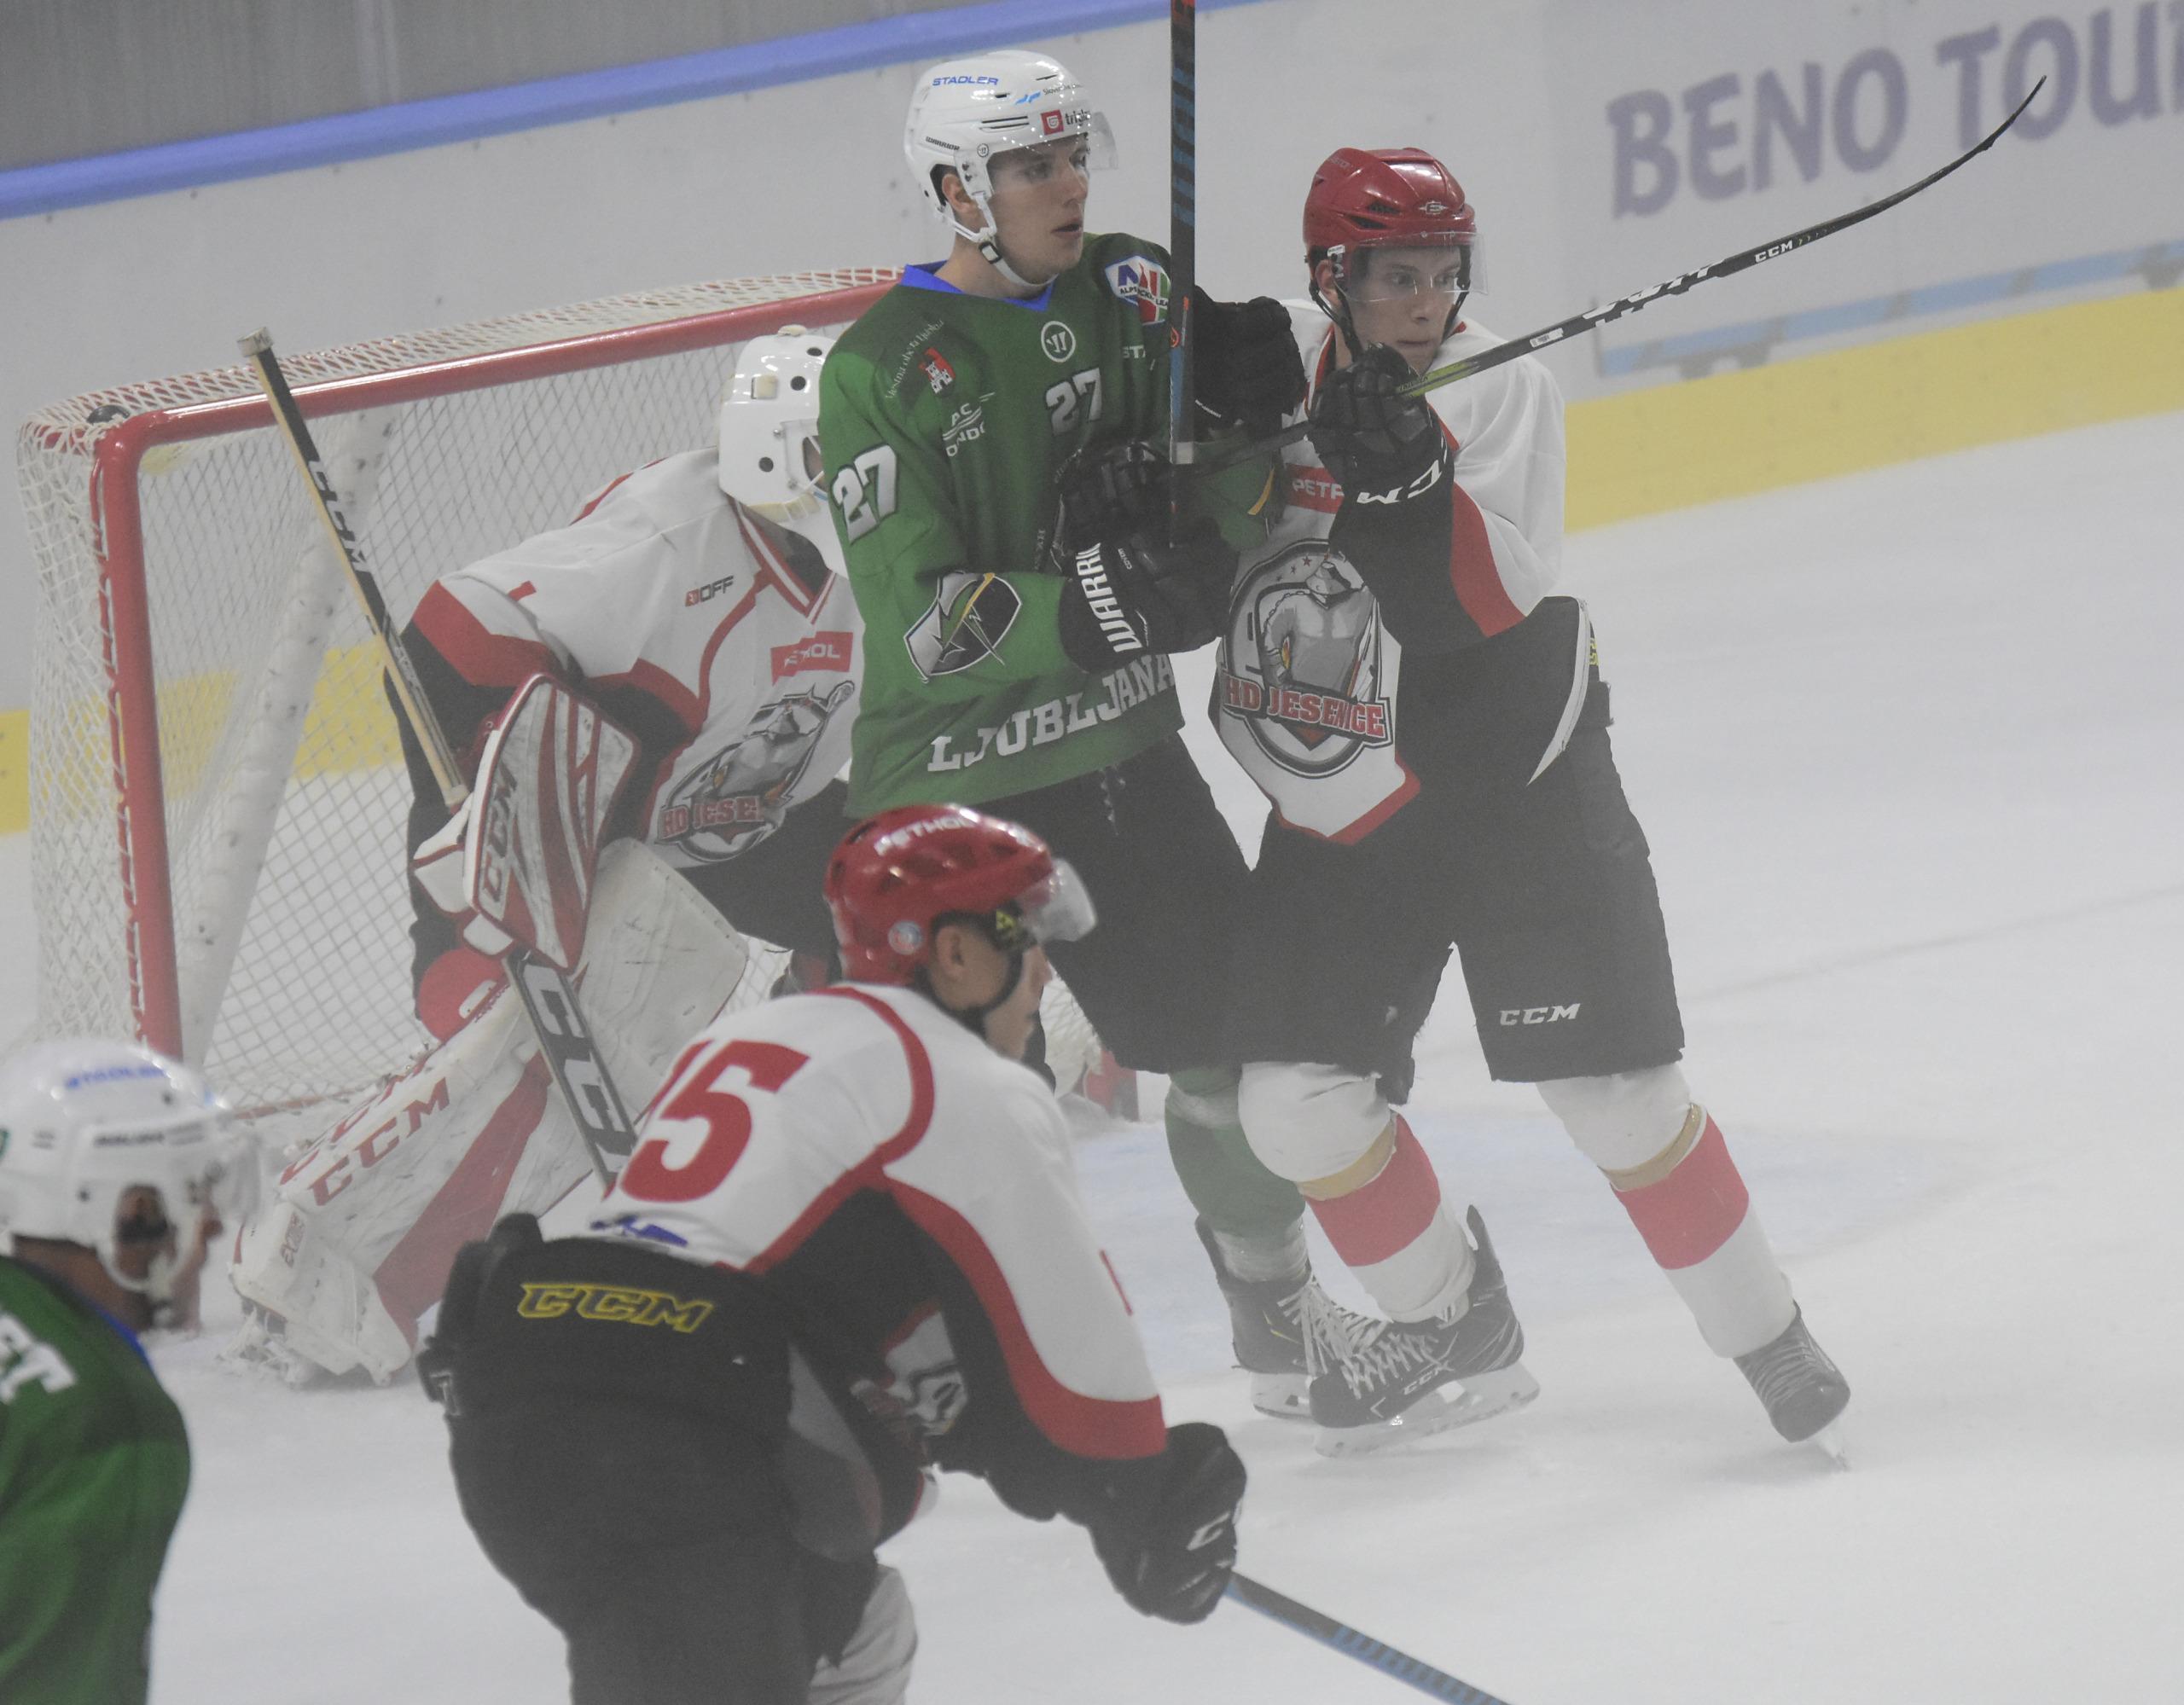 Pokal Slovenije 20/21